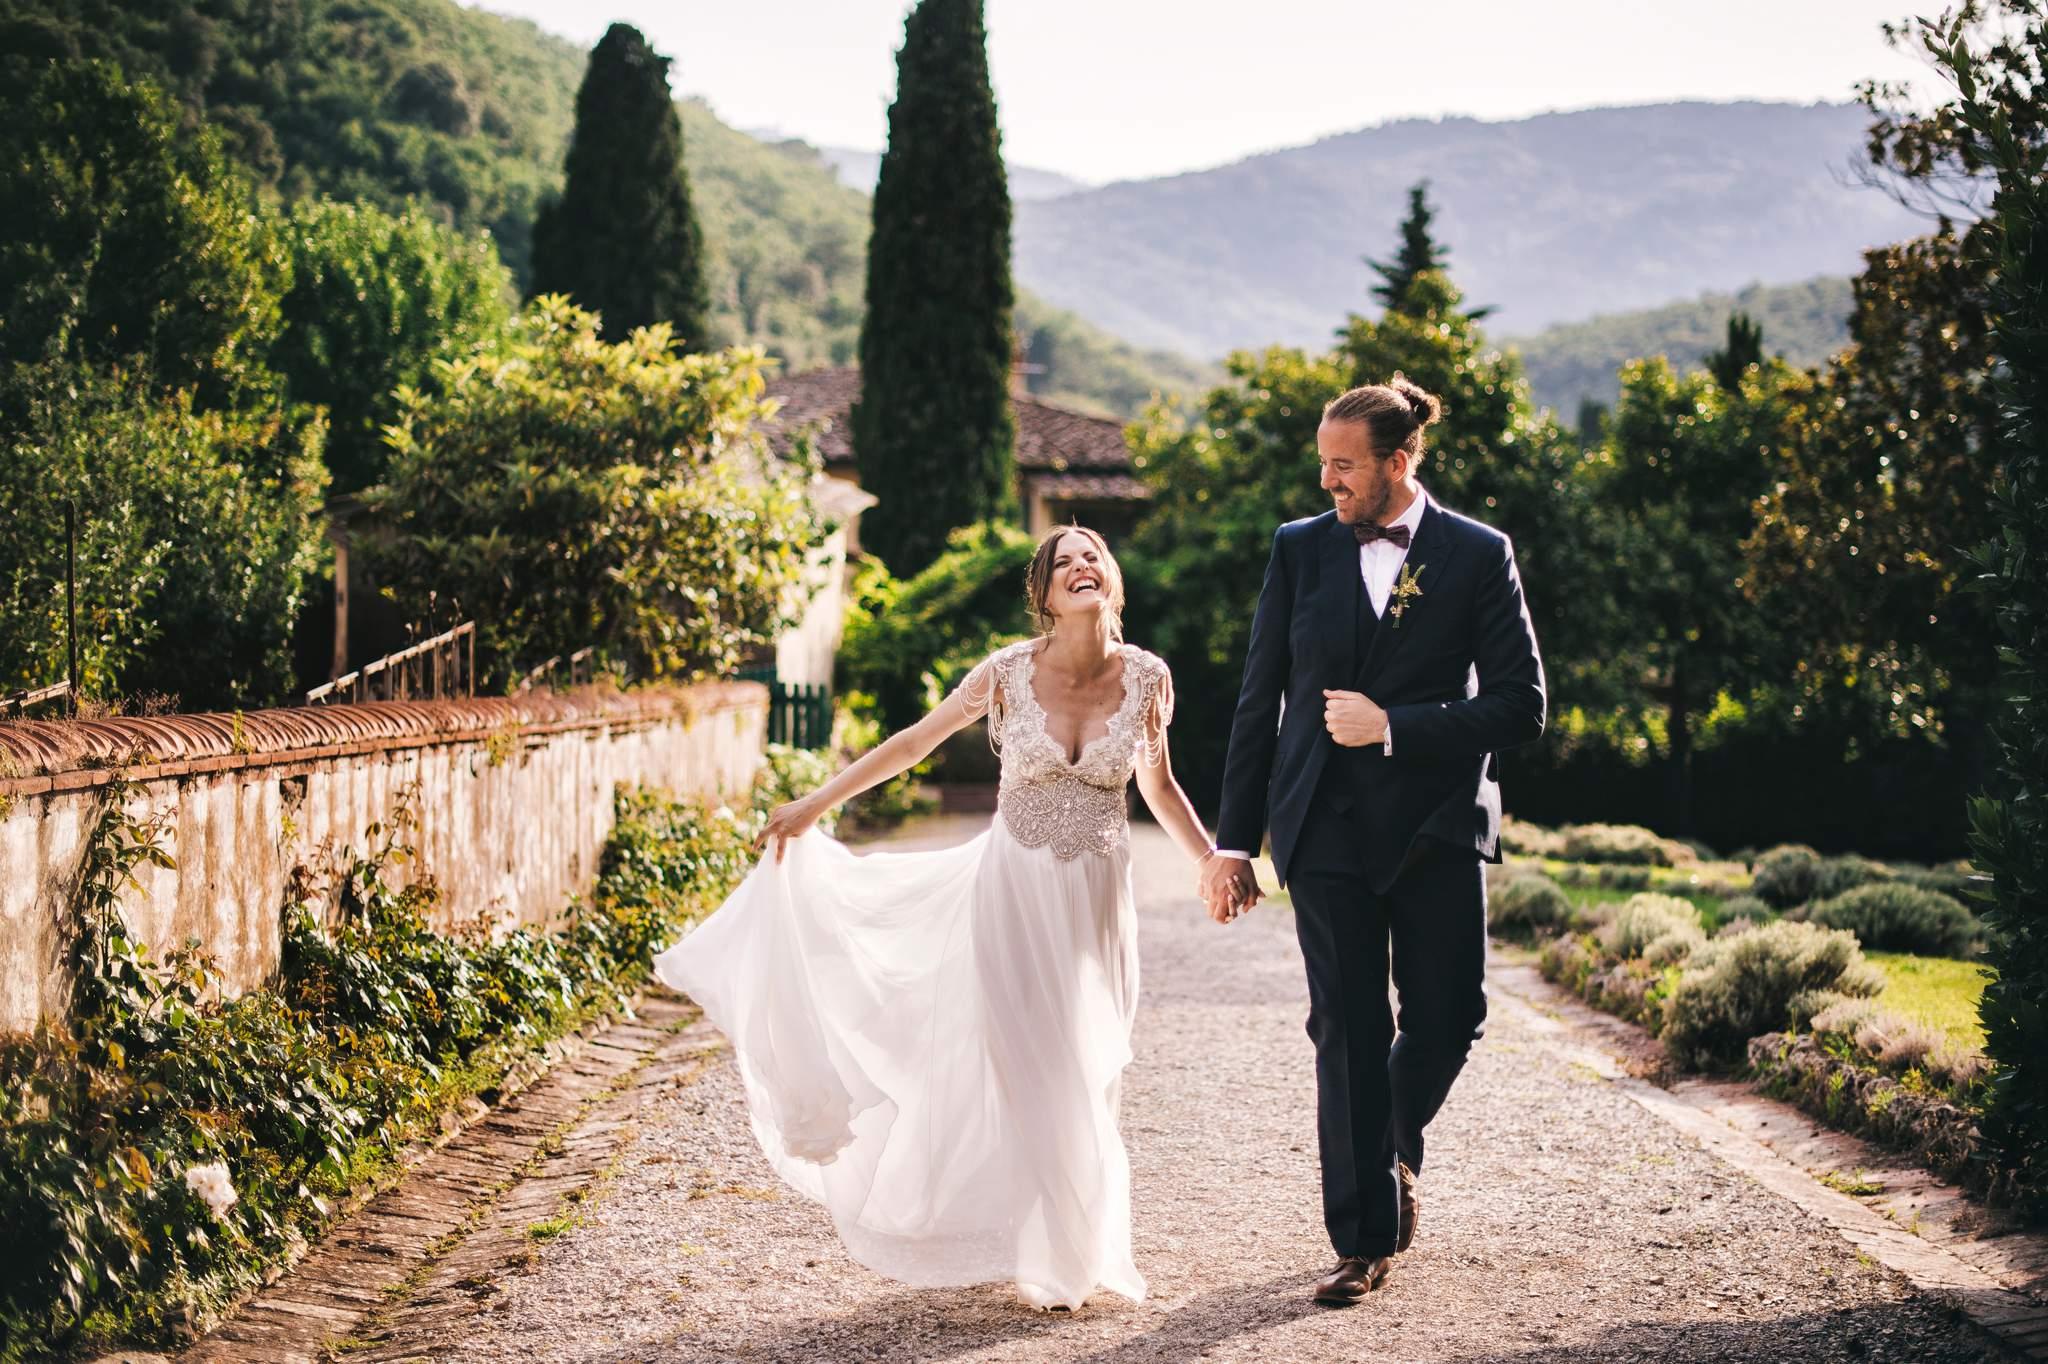 27wedding-photographer-villa-petrolo